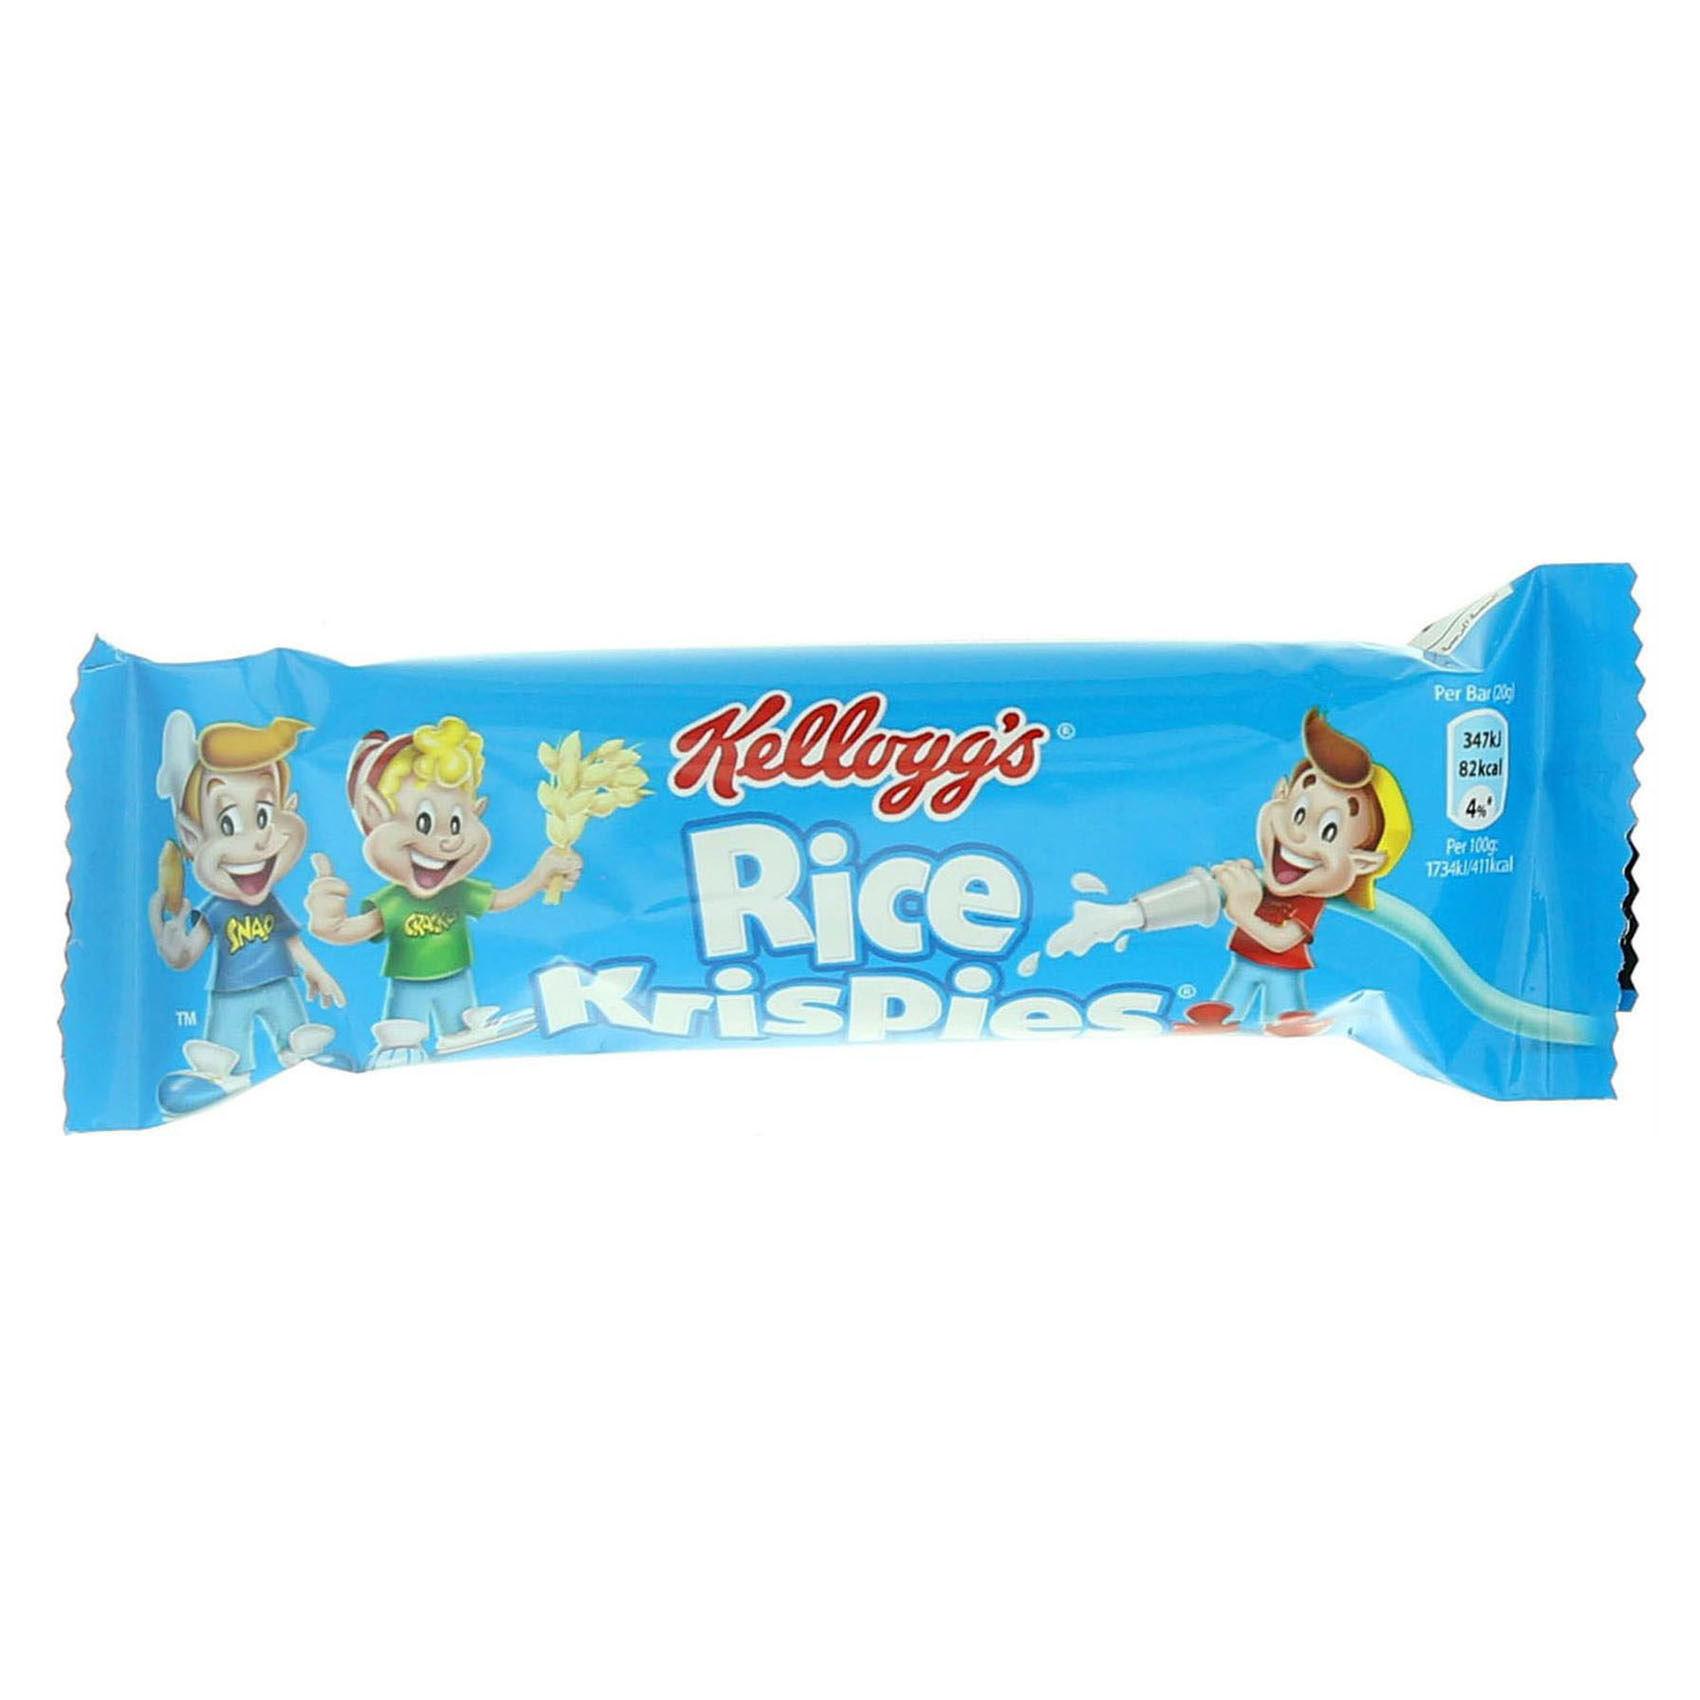 KELLOGG'S RICE KRISPIES BAR 20G